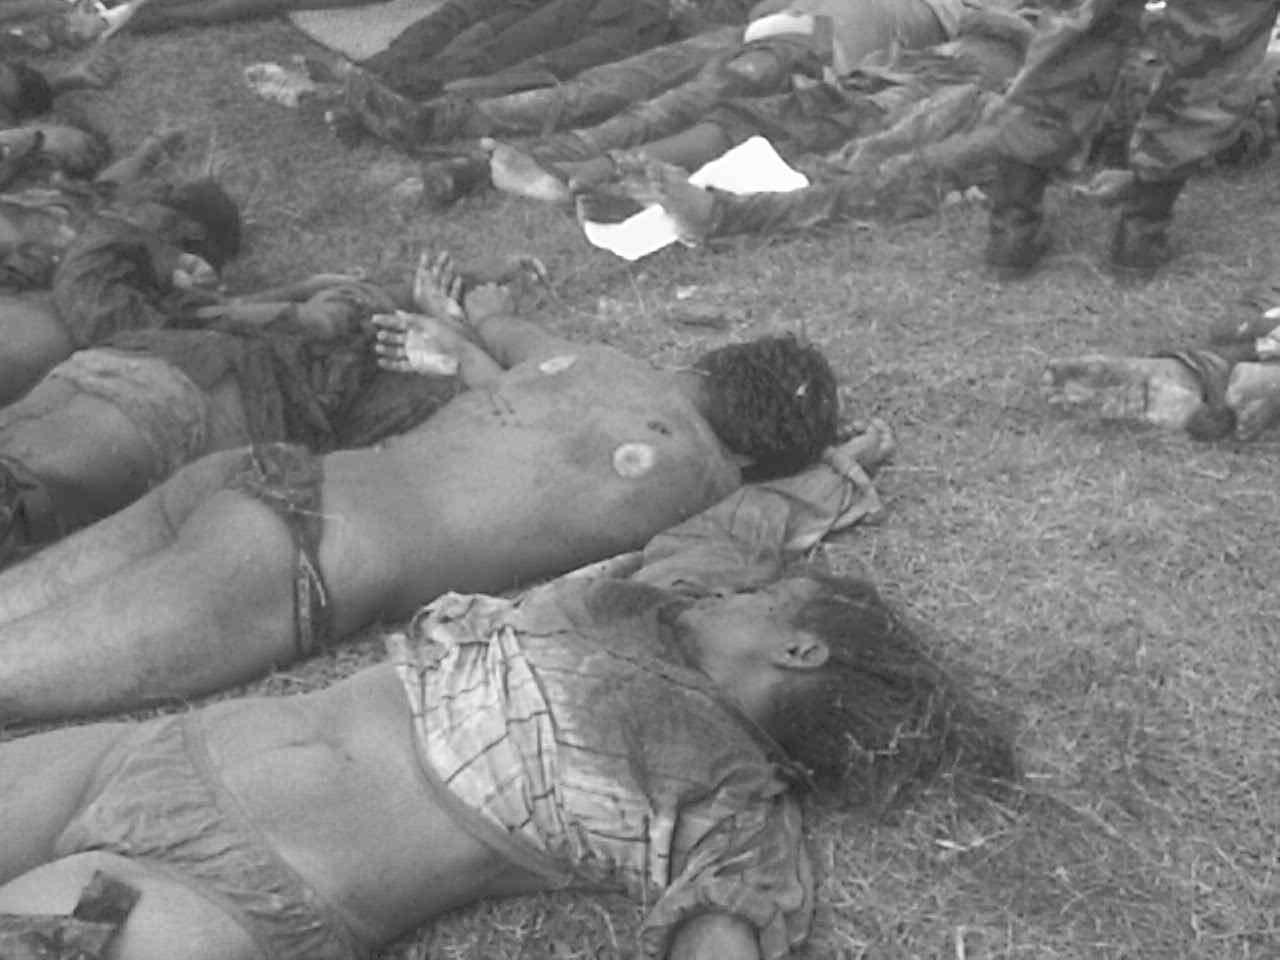 free war crime sex video